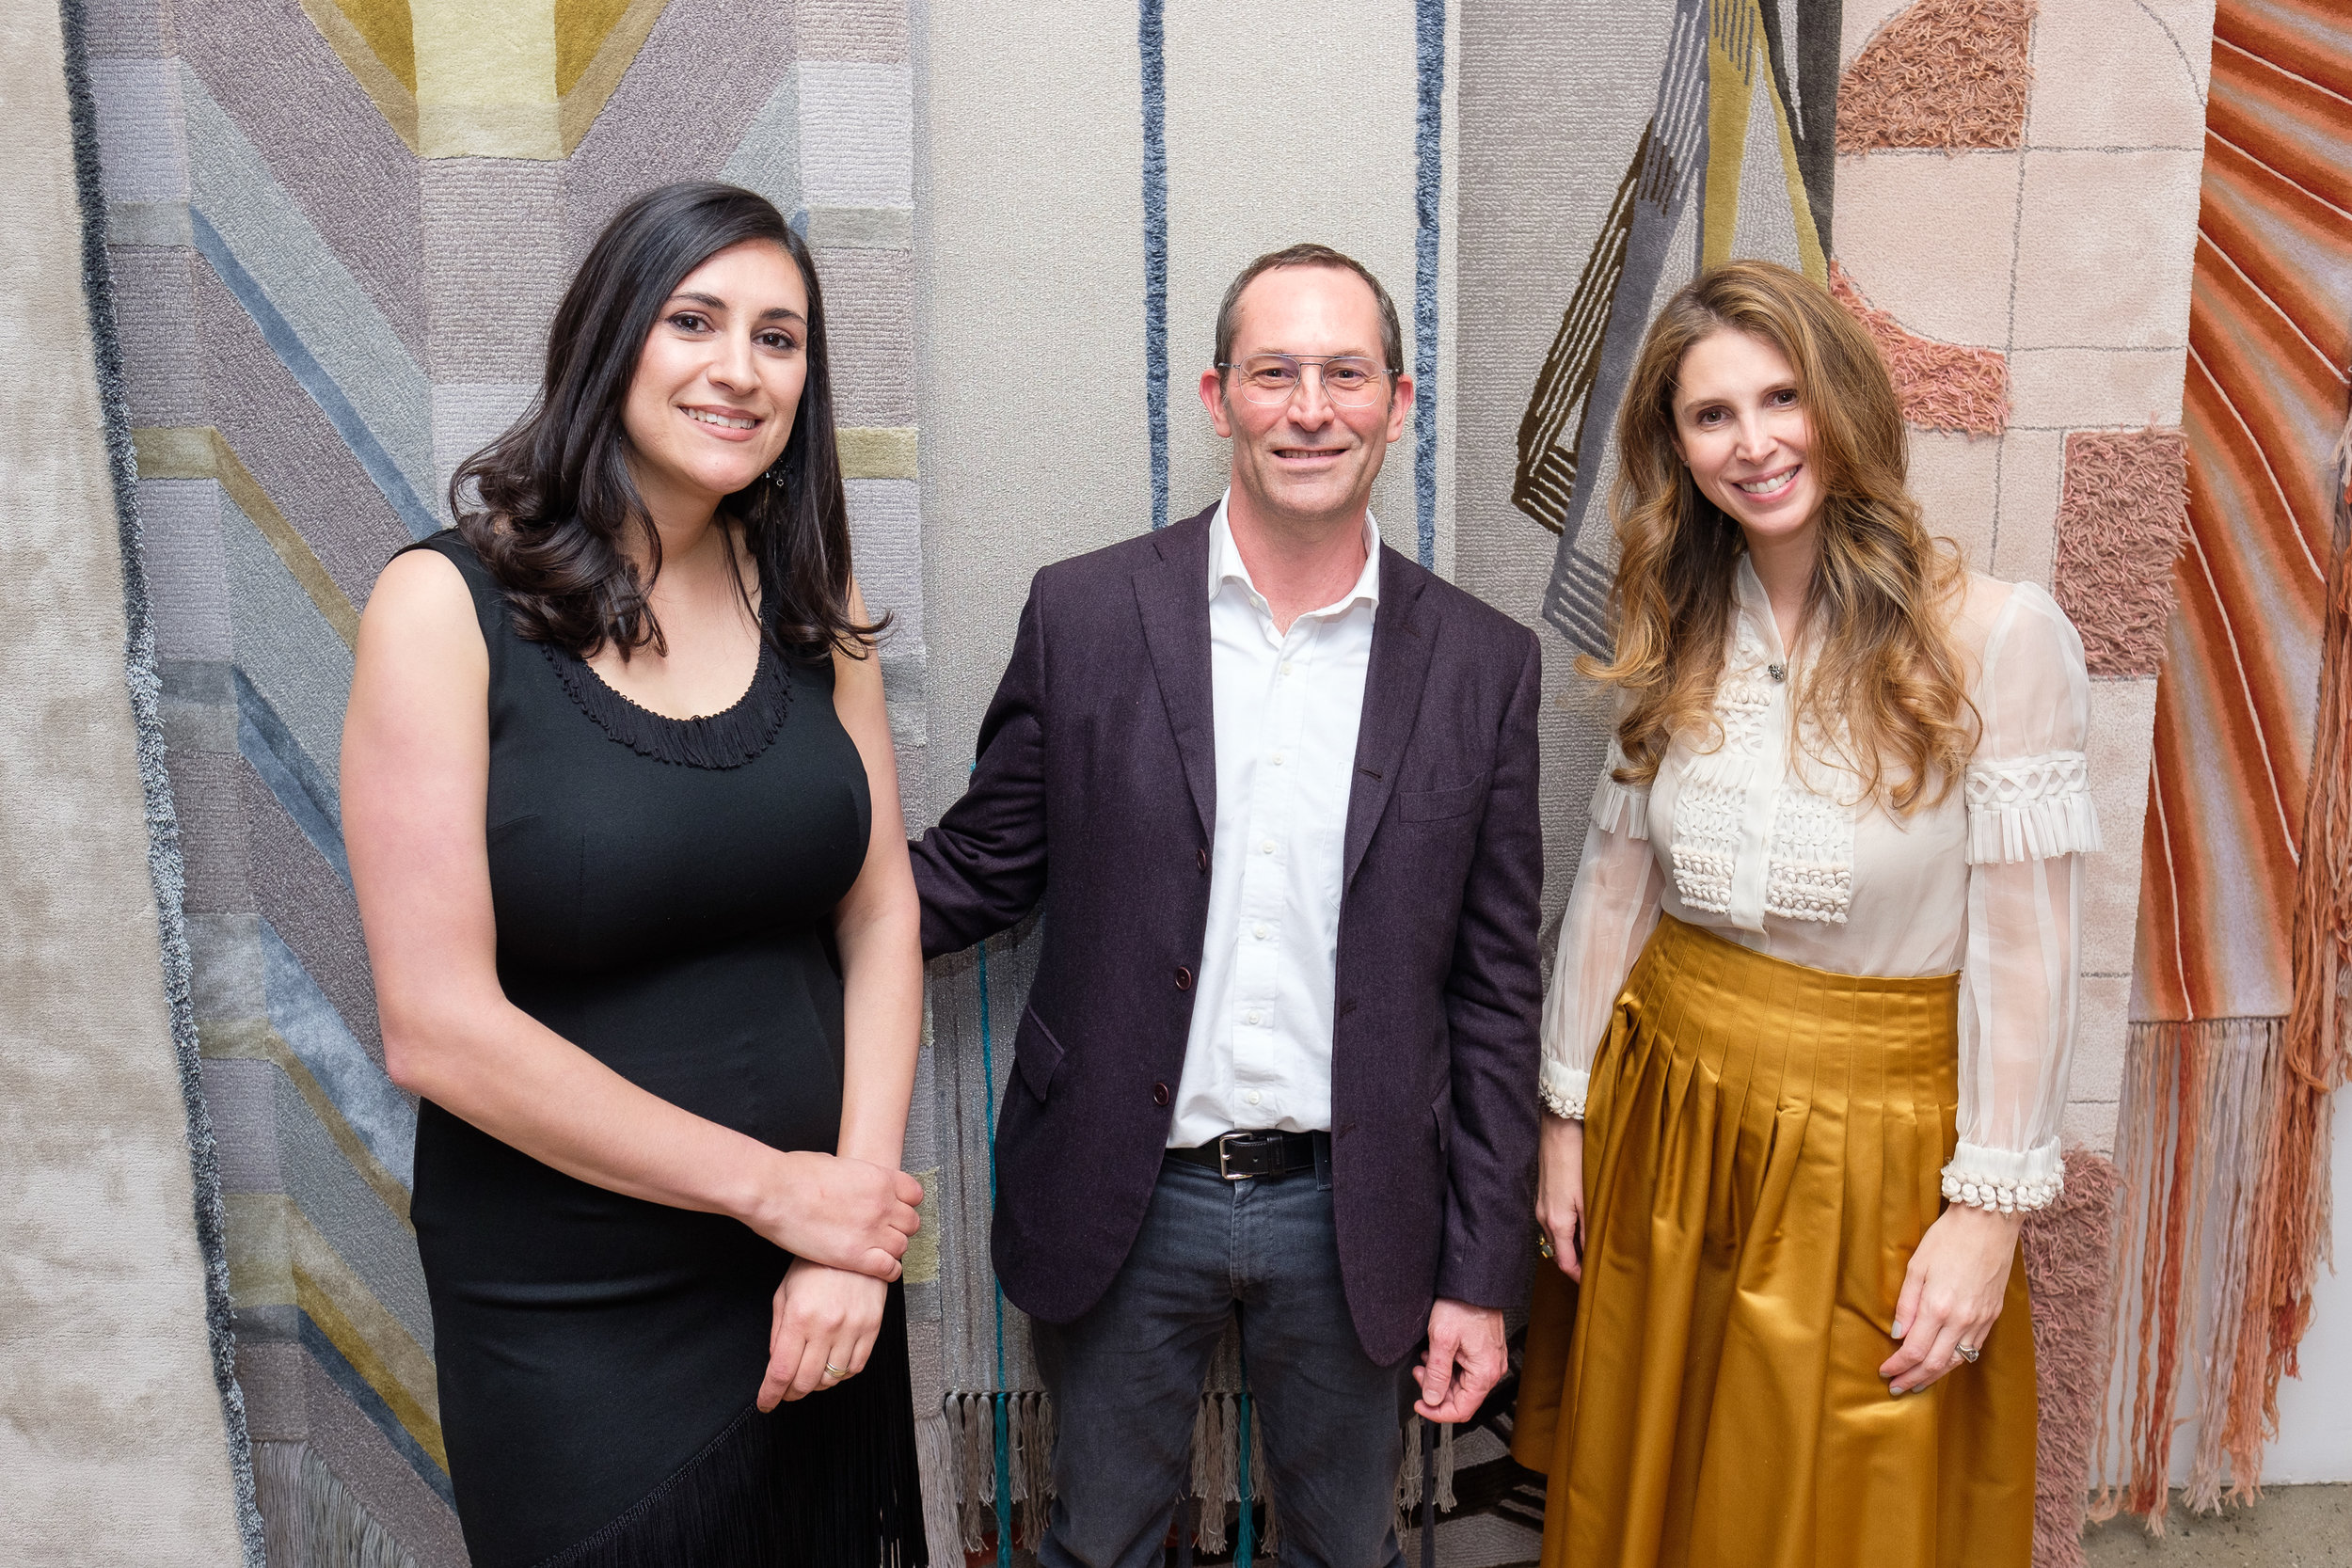 Ariana Massouh (Edward Fields), David Hamilton (Hearst magazines), Juliana Polastri (Edward Fields)